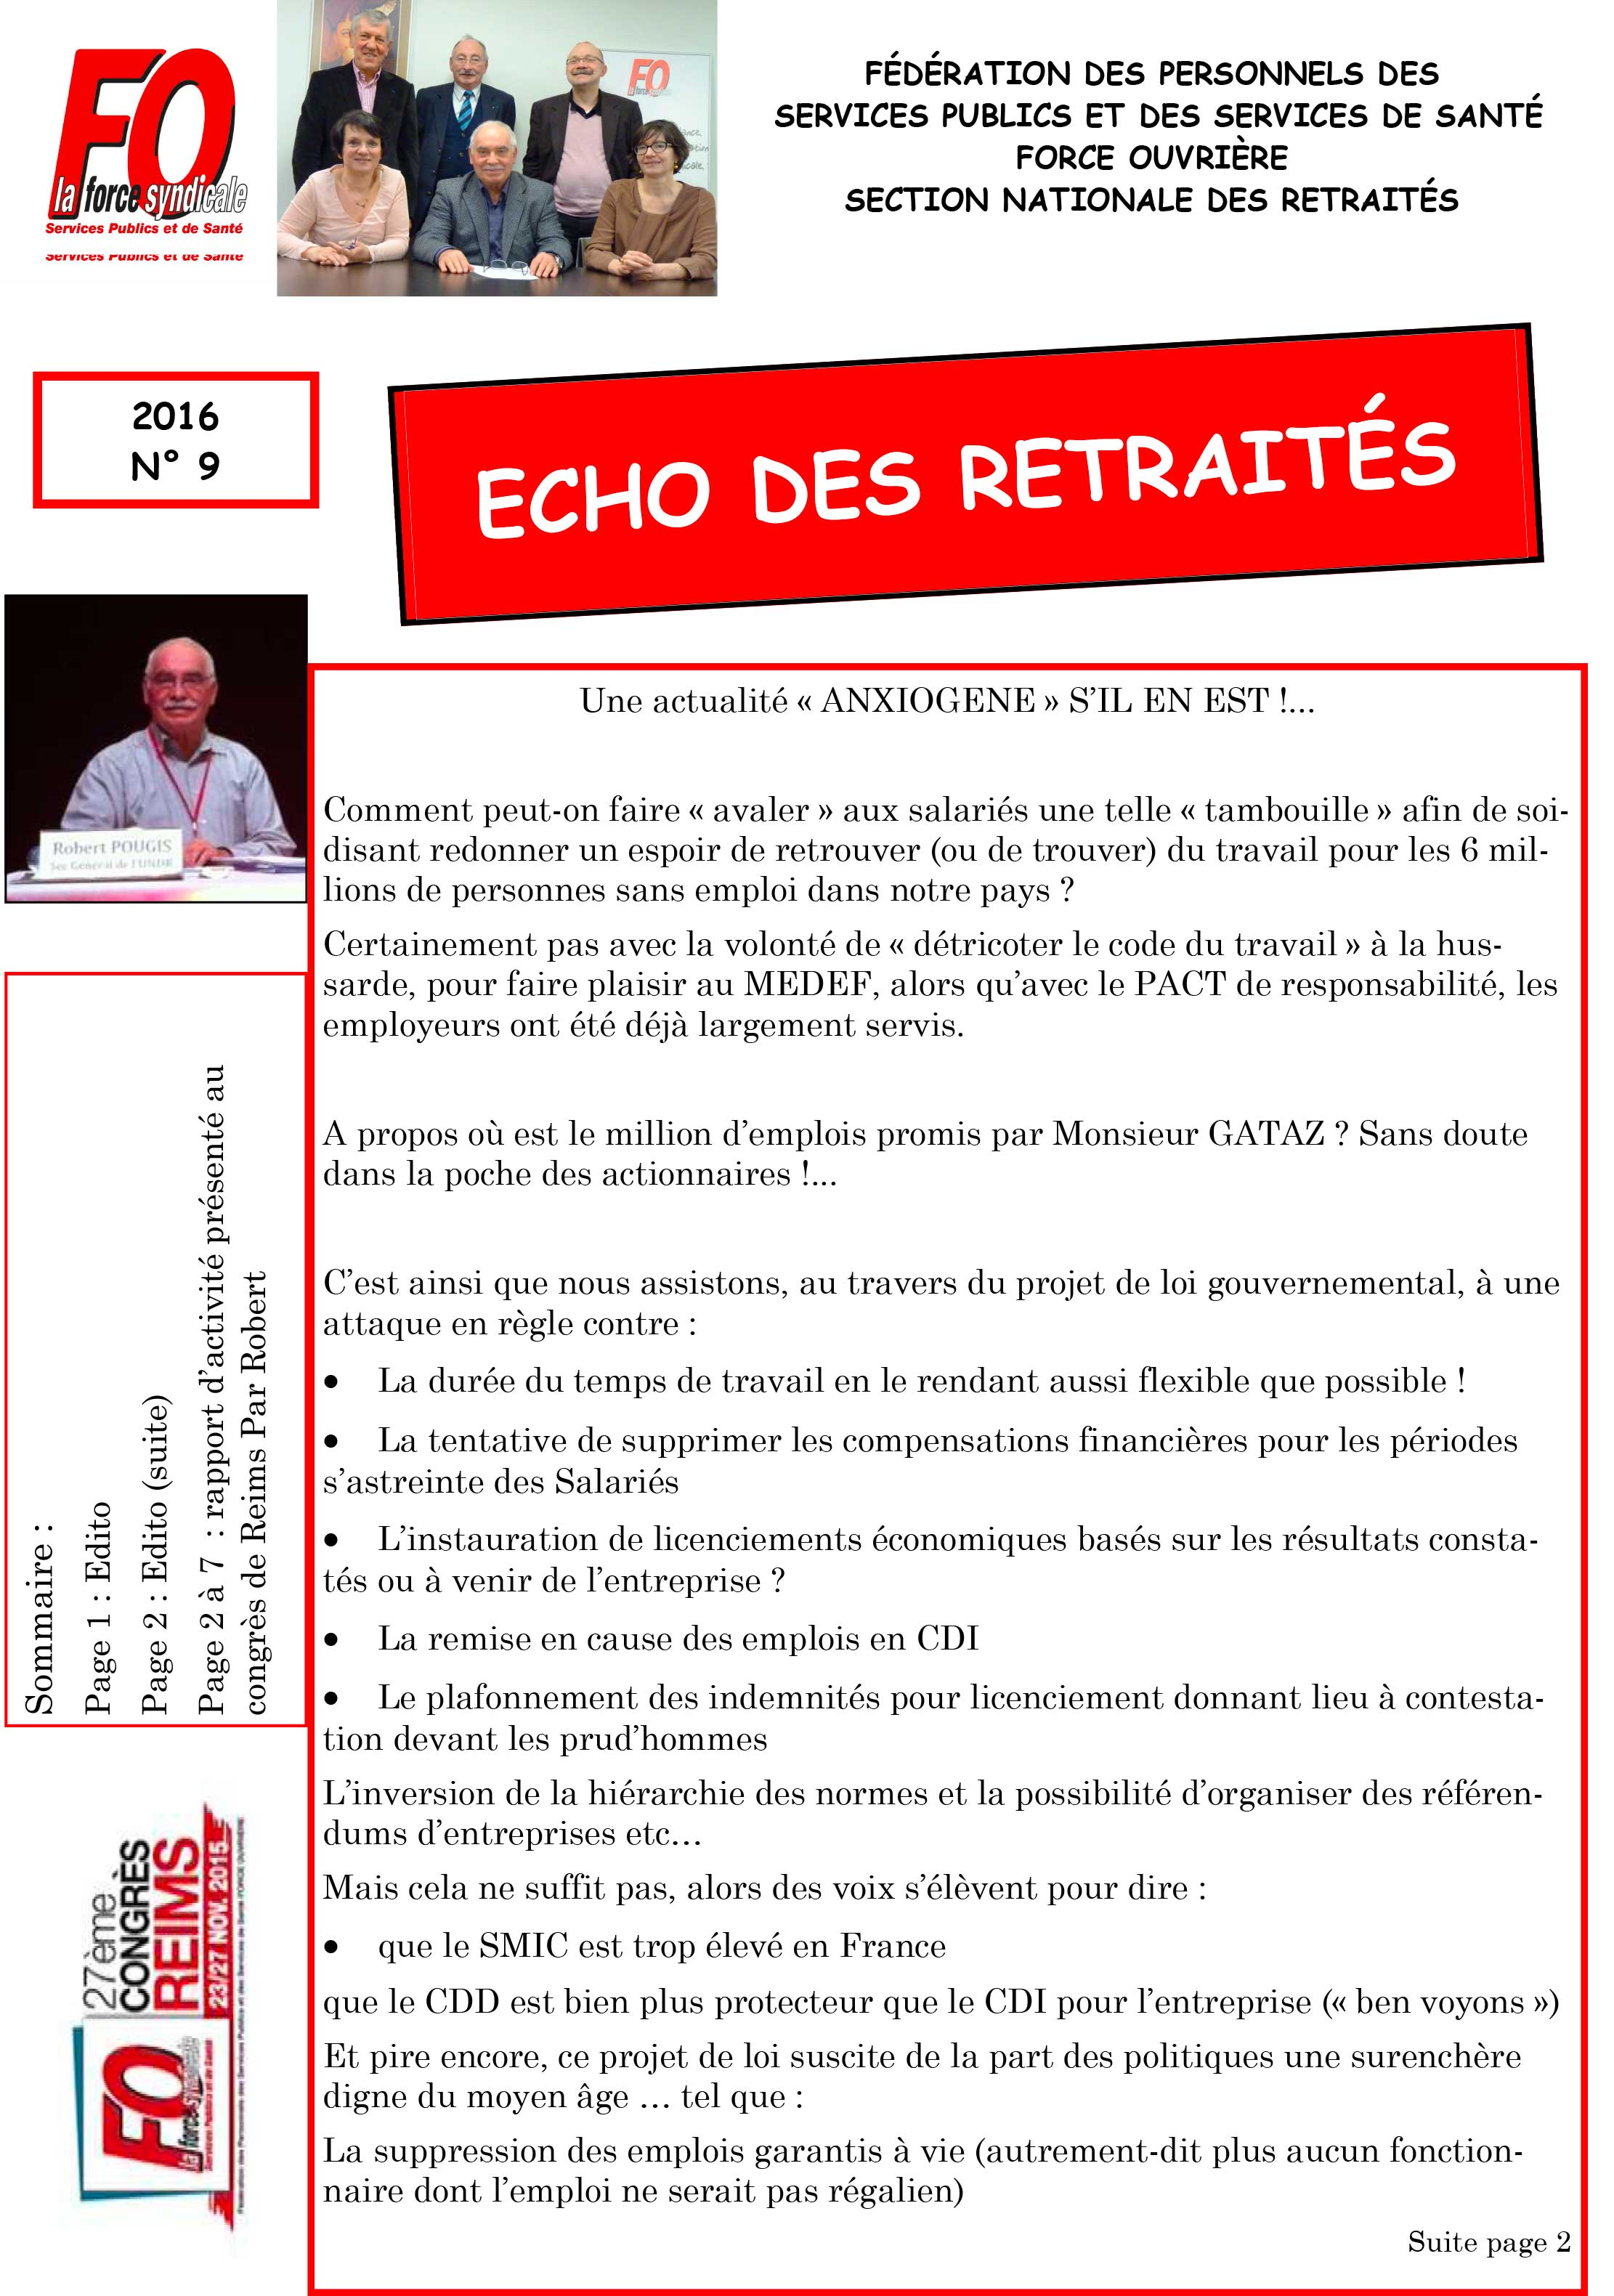 echo_des_retraites-1